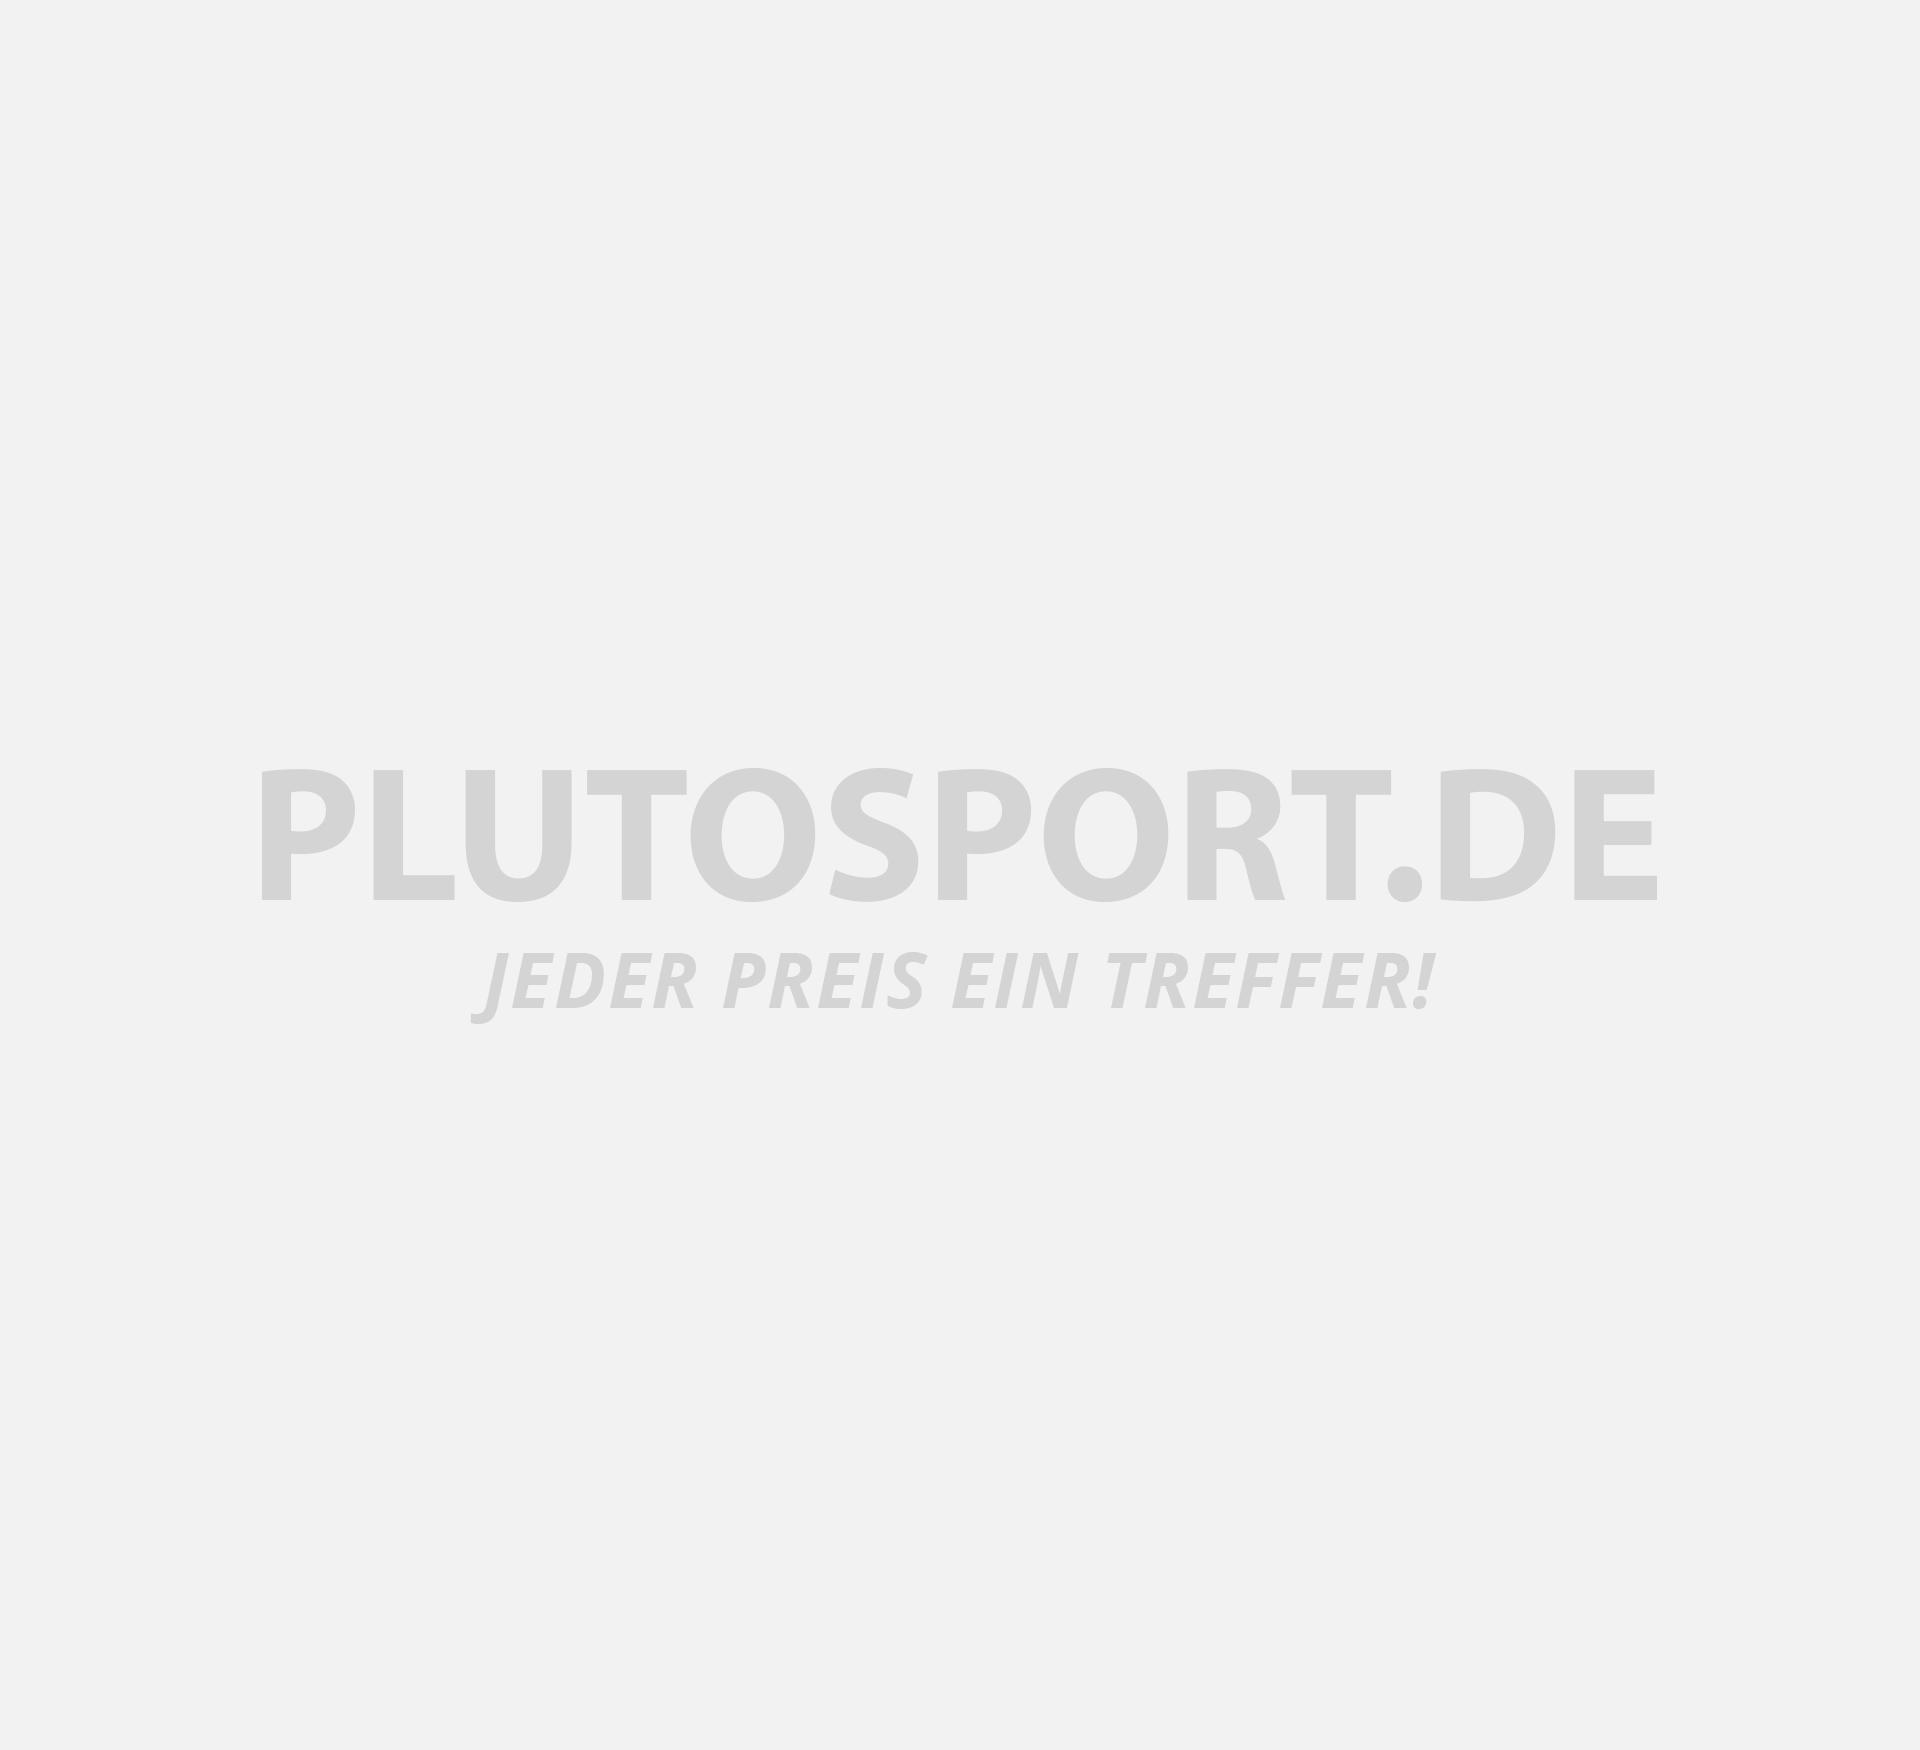 Nike Pro Top bei Plutosport